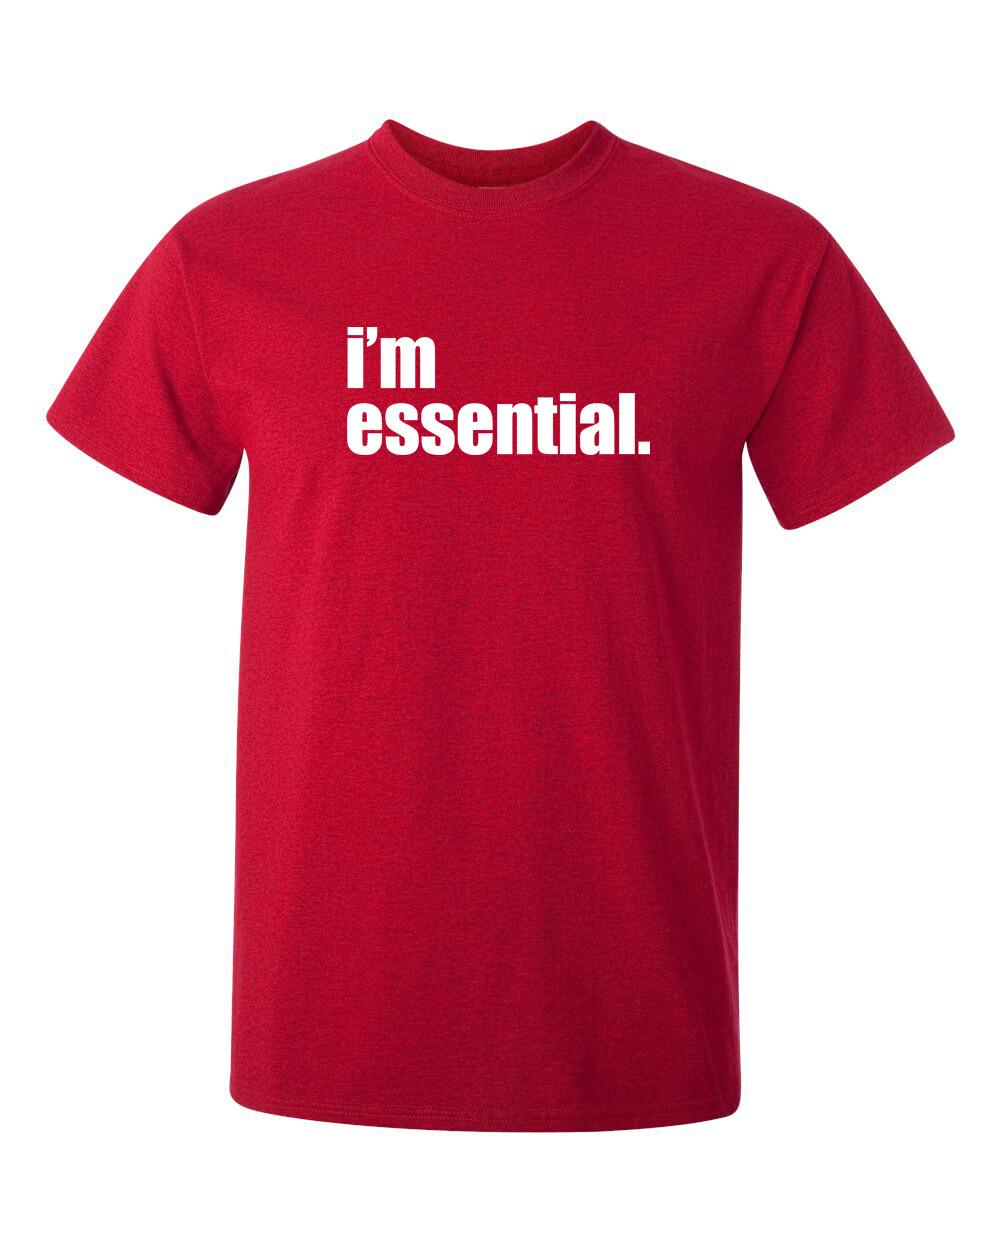 i'm essential